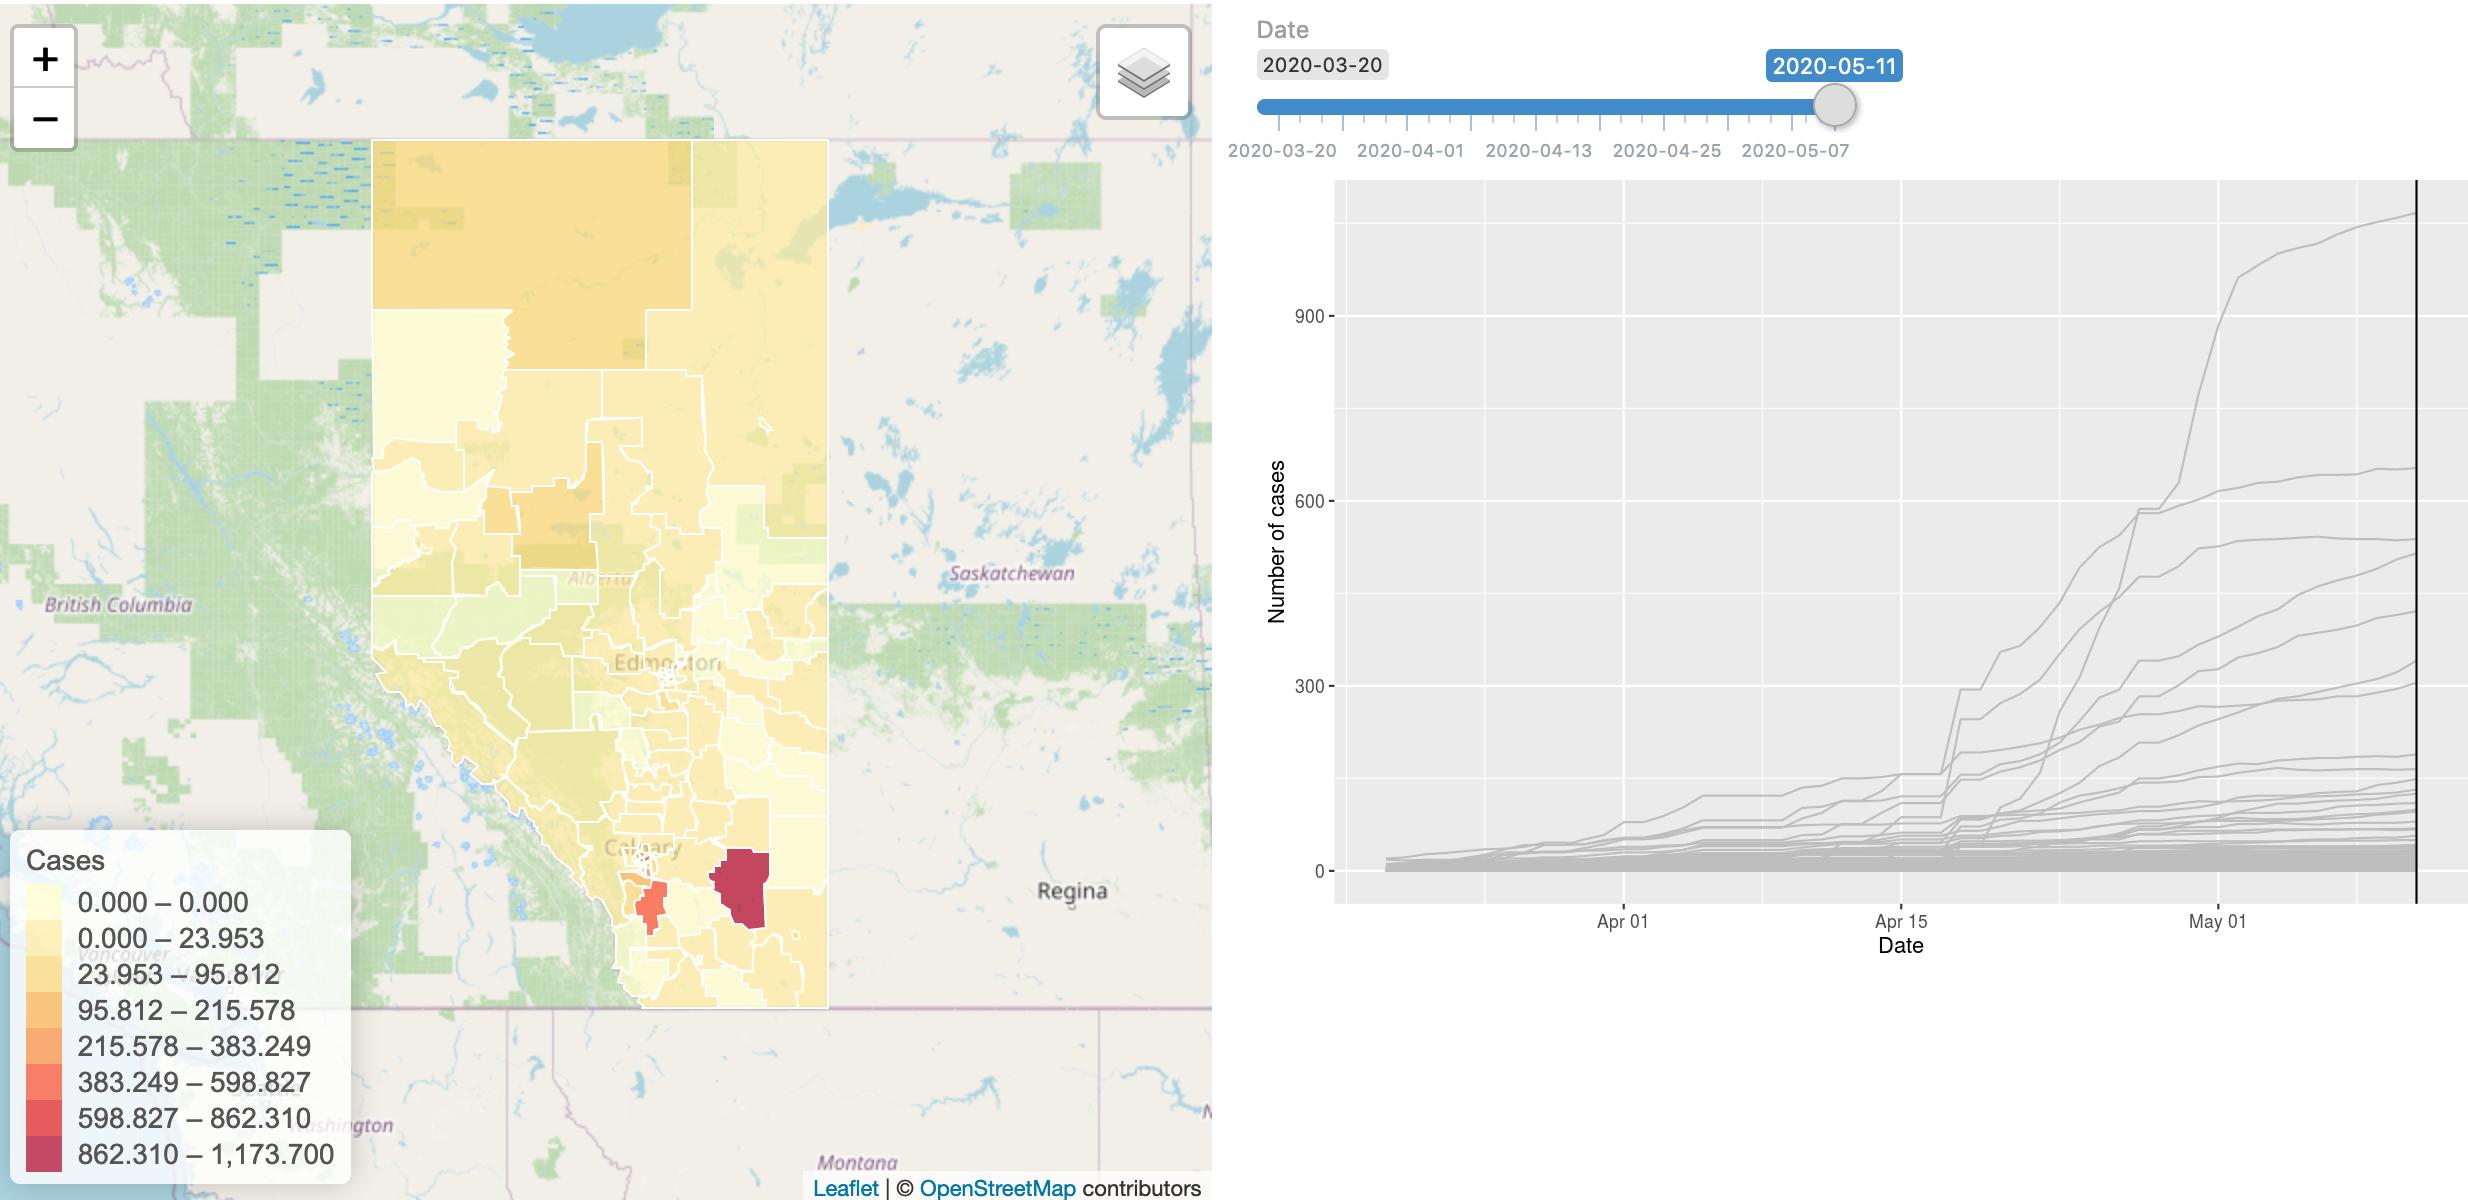 Map of COVID-19 cases in Alberta